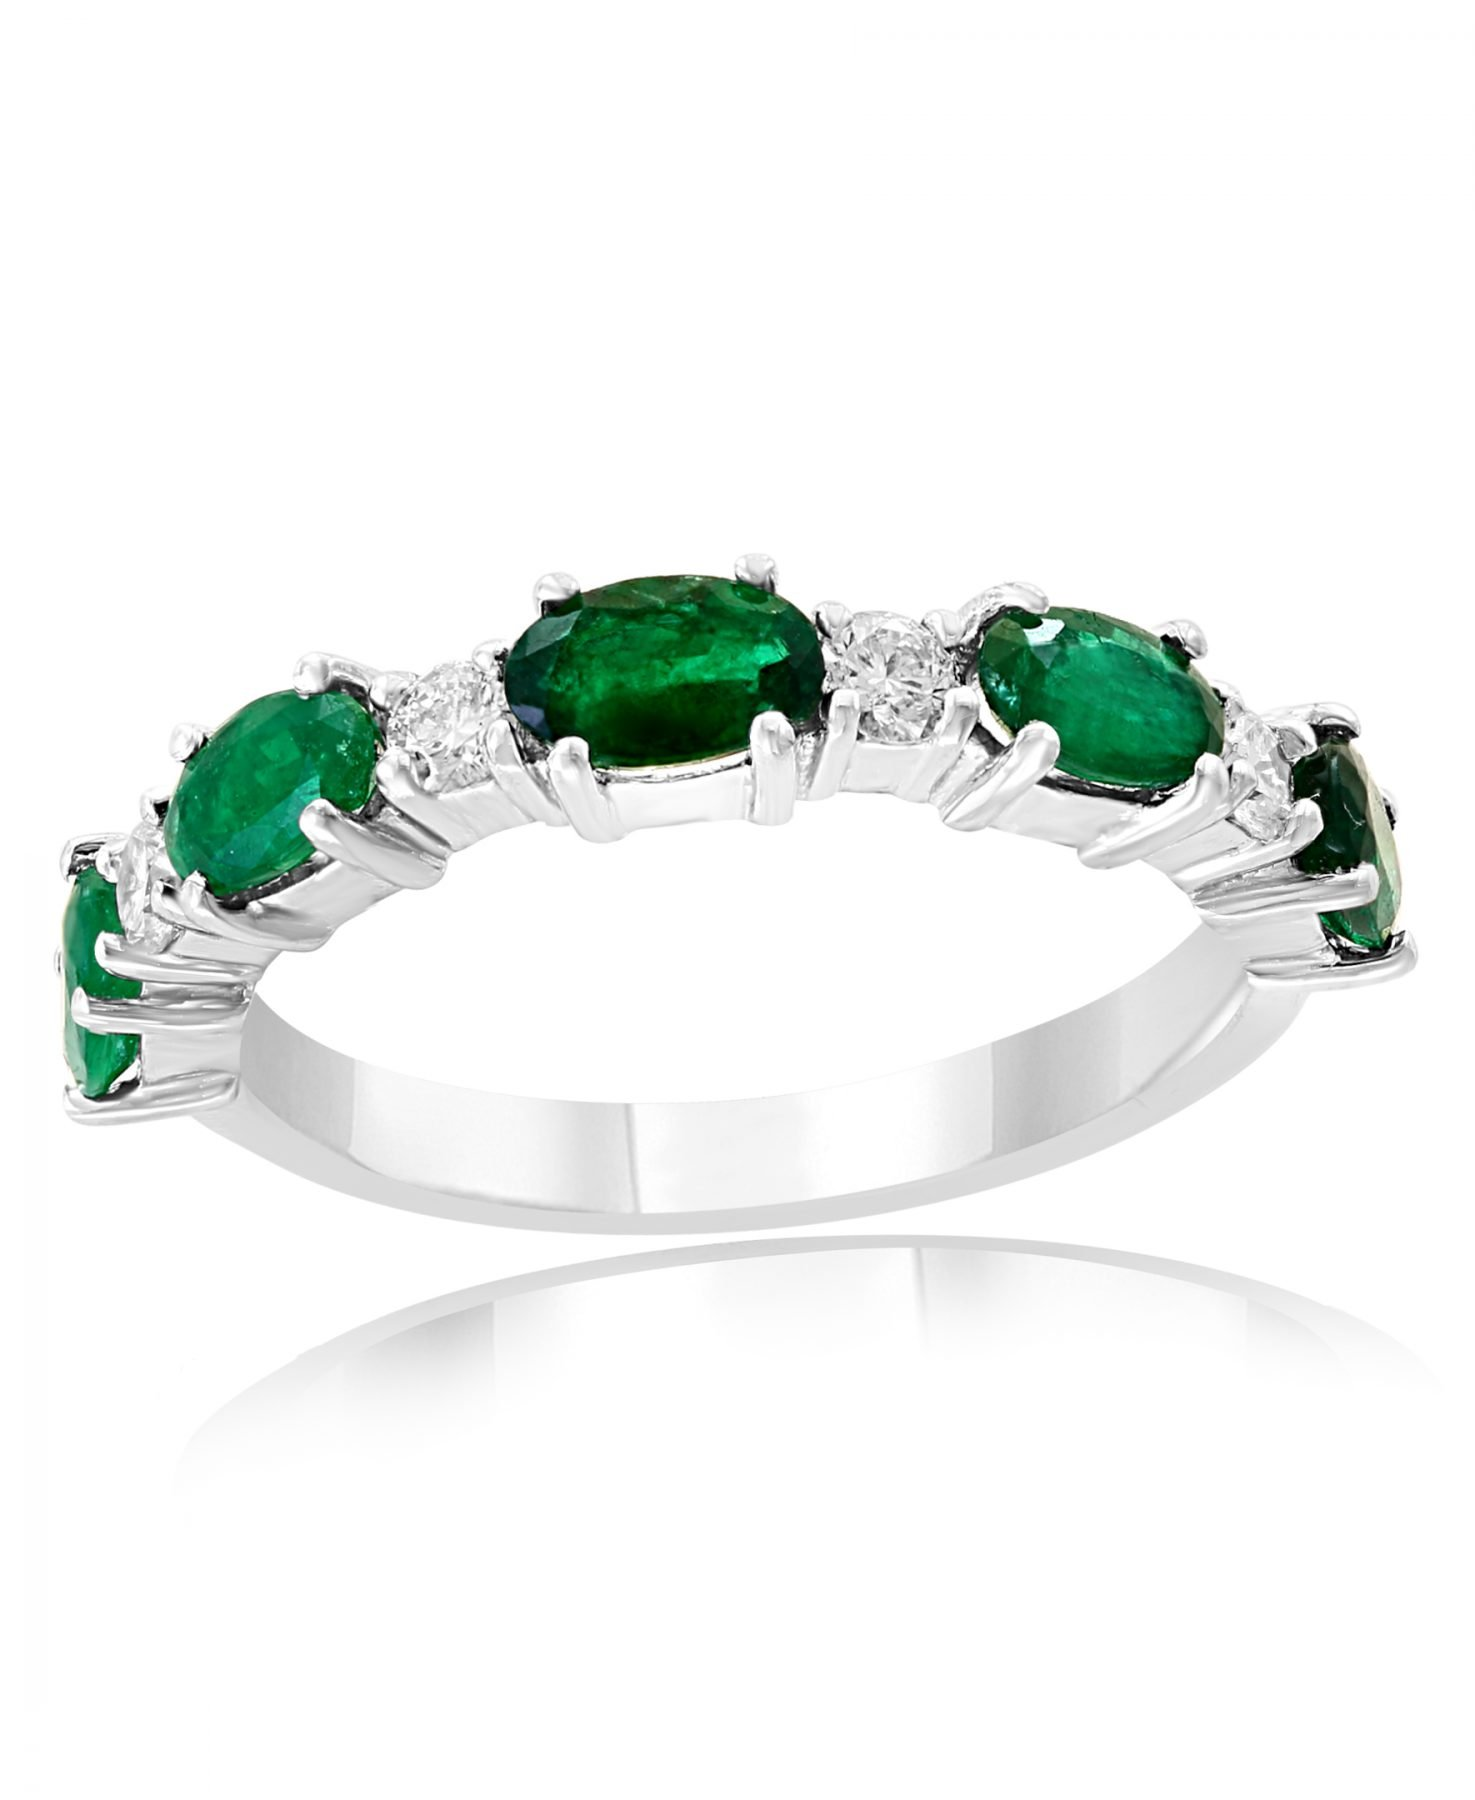 Emerald & Diamond Oval Anniversary Band